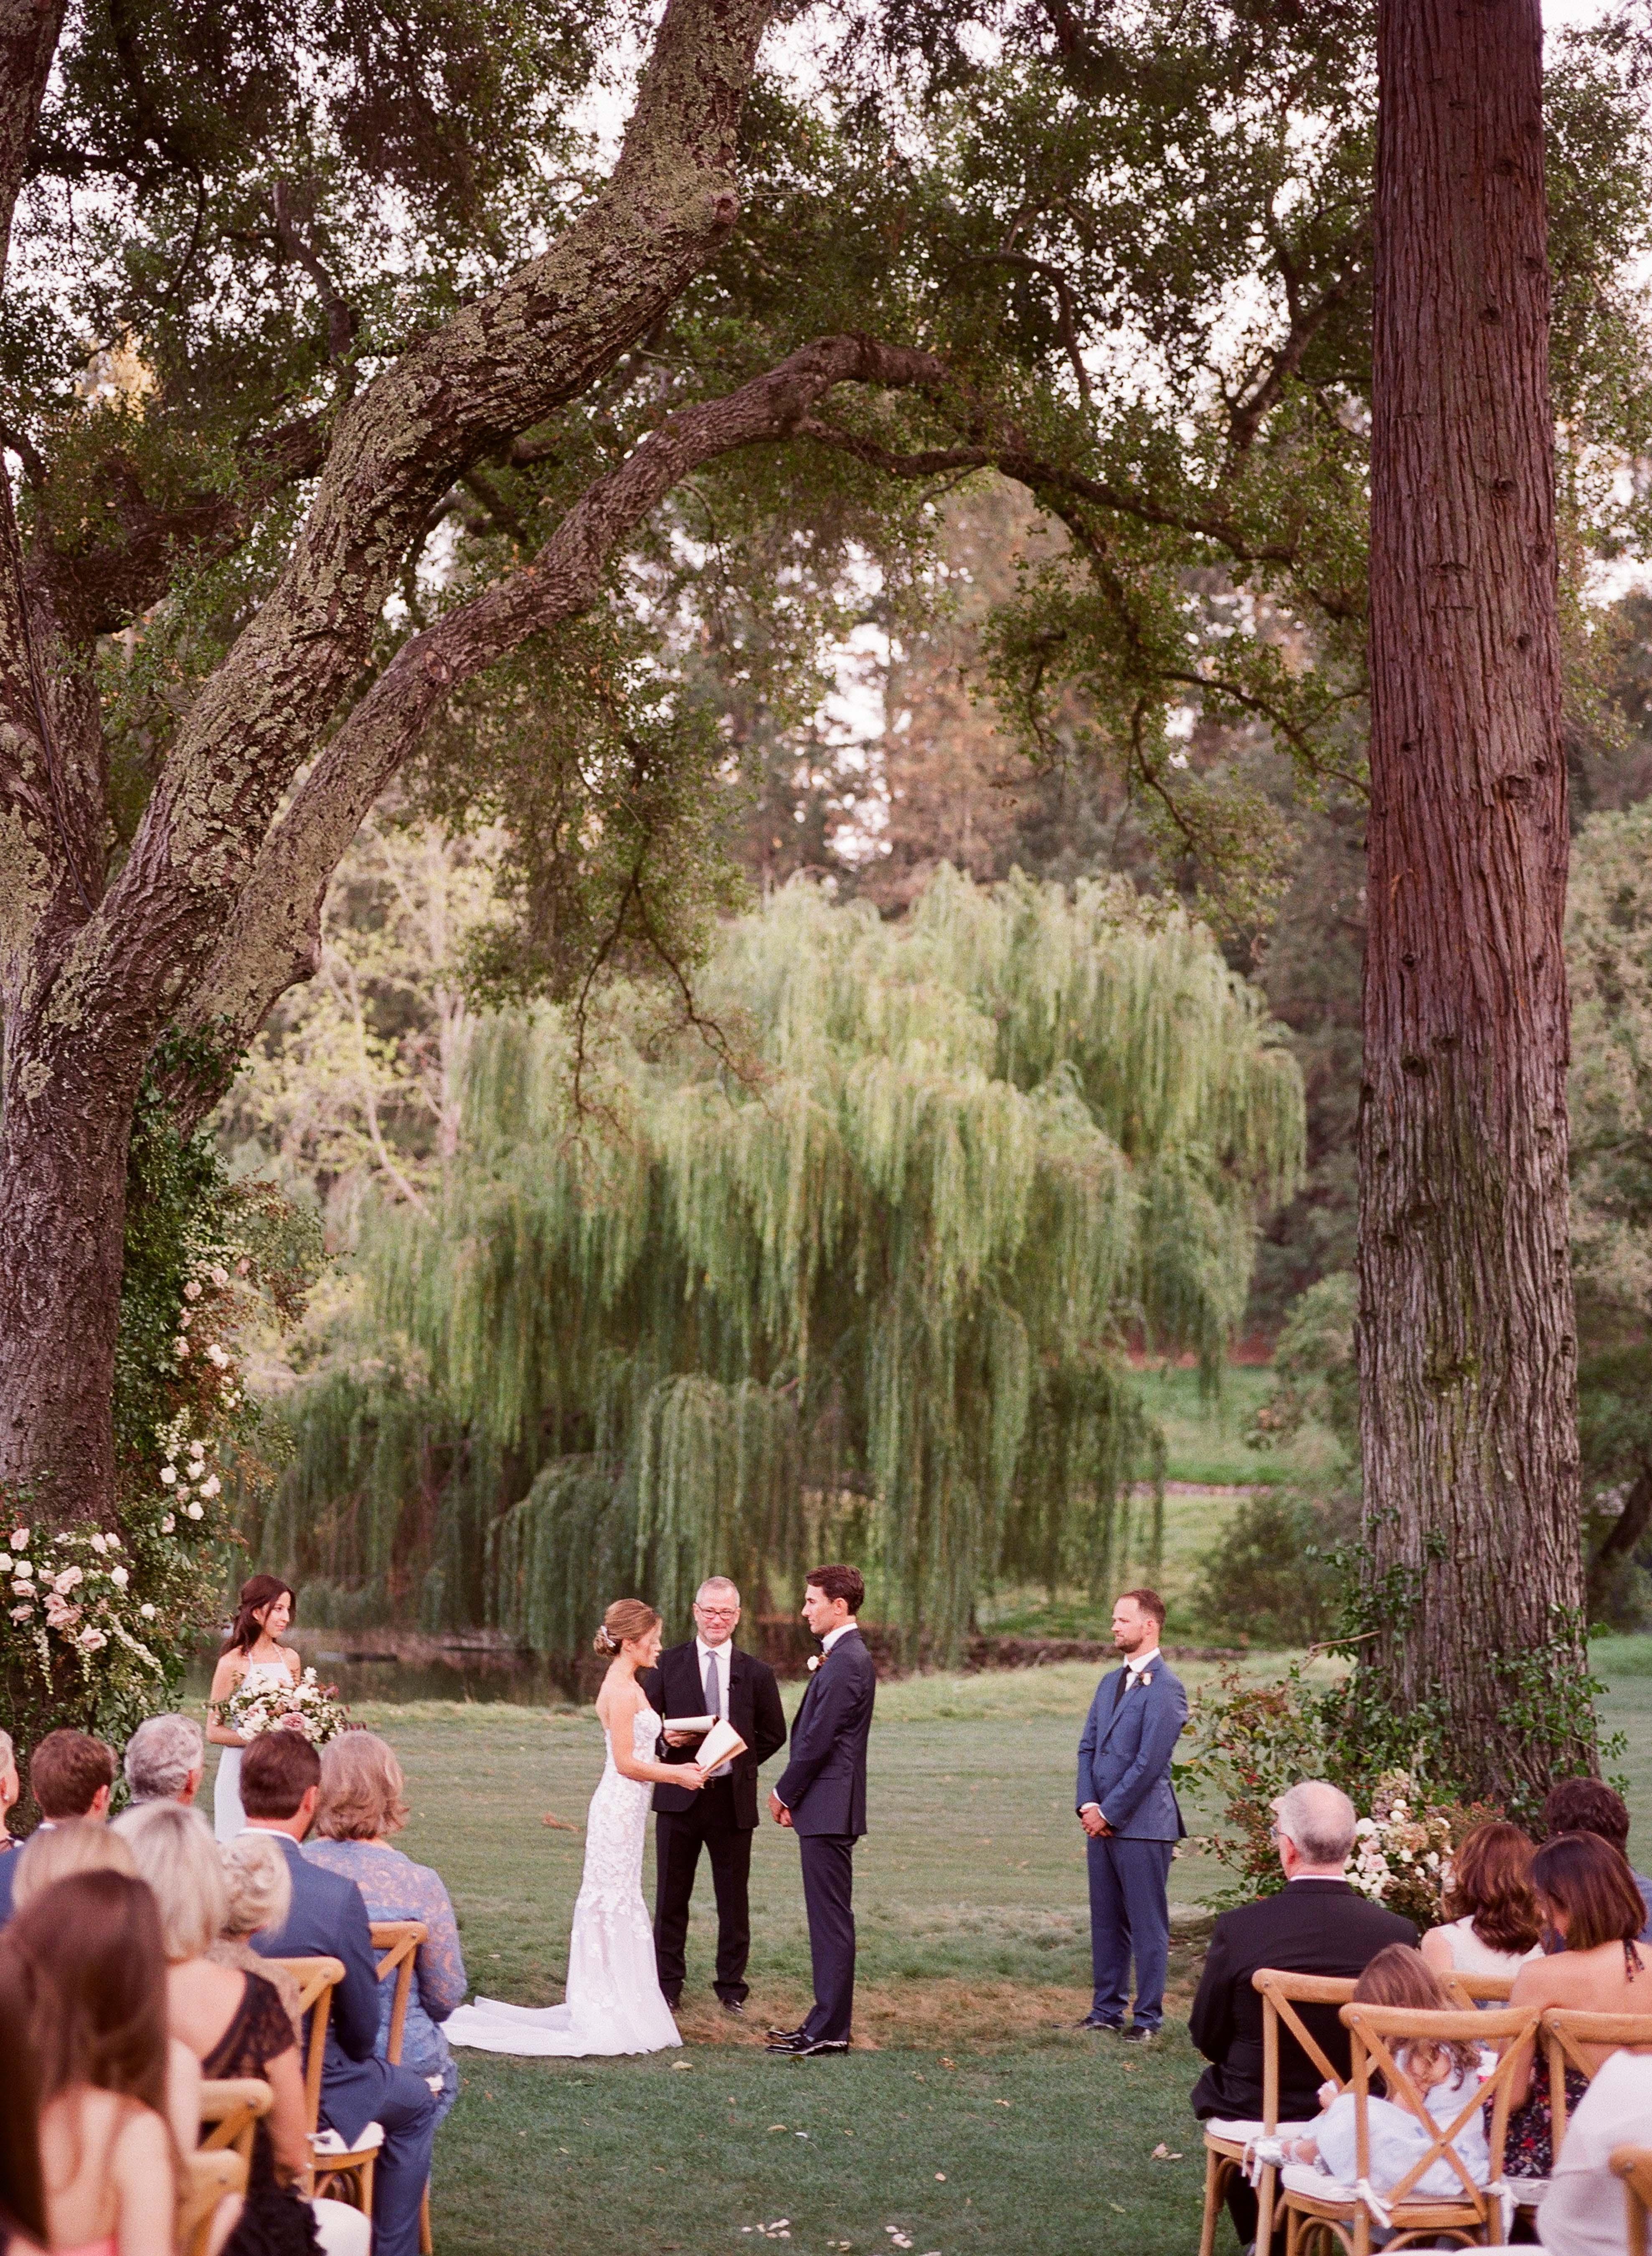 caitlin michael wedding ceremony vows